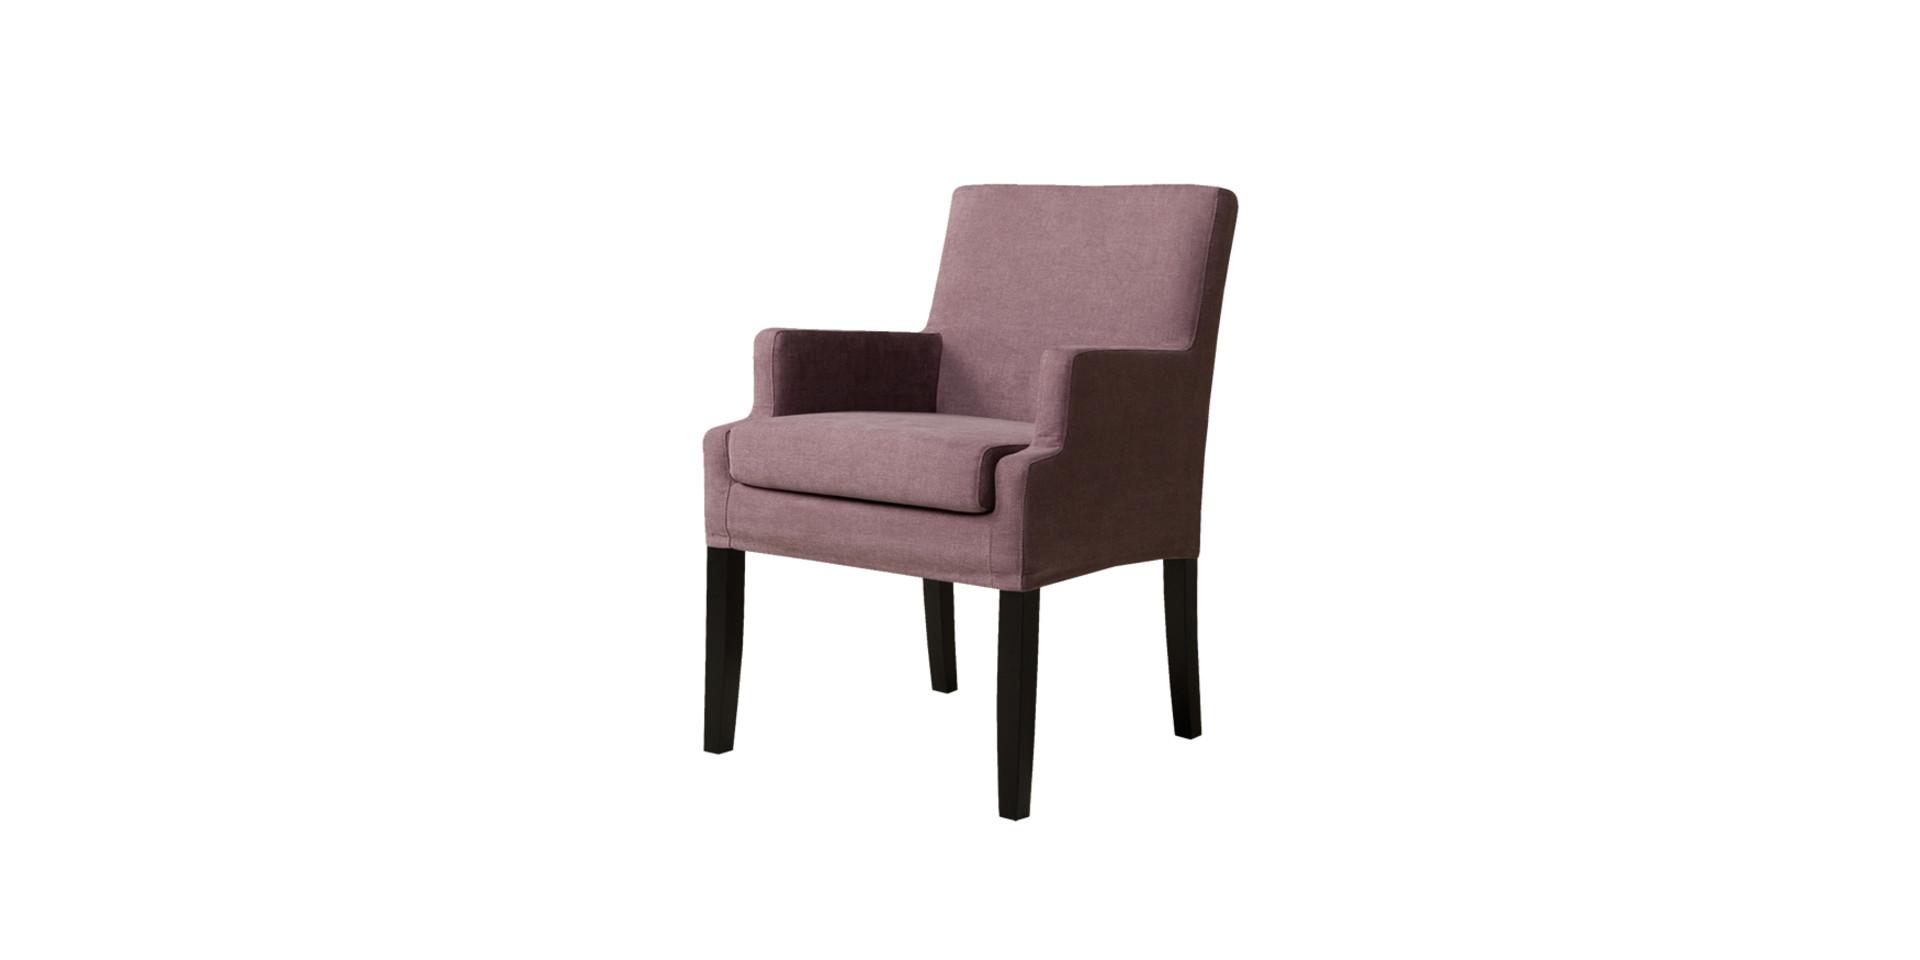 sits-merlin-fauteuil-chair_brest116_plum_4